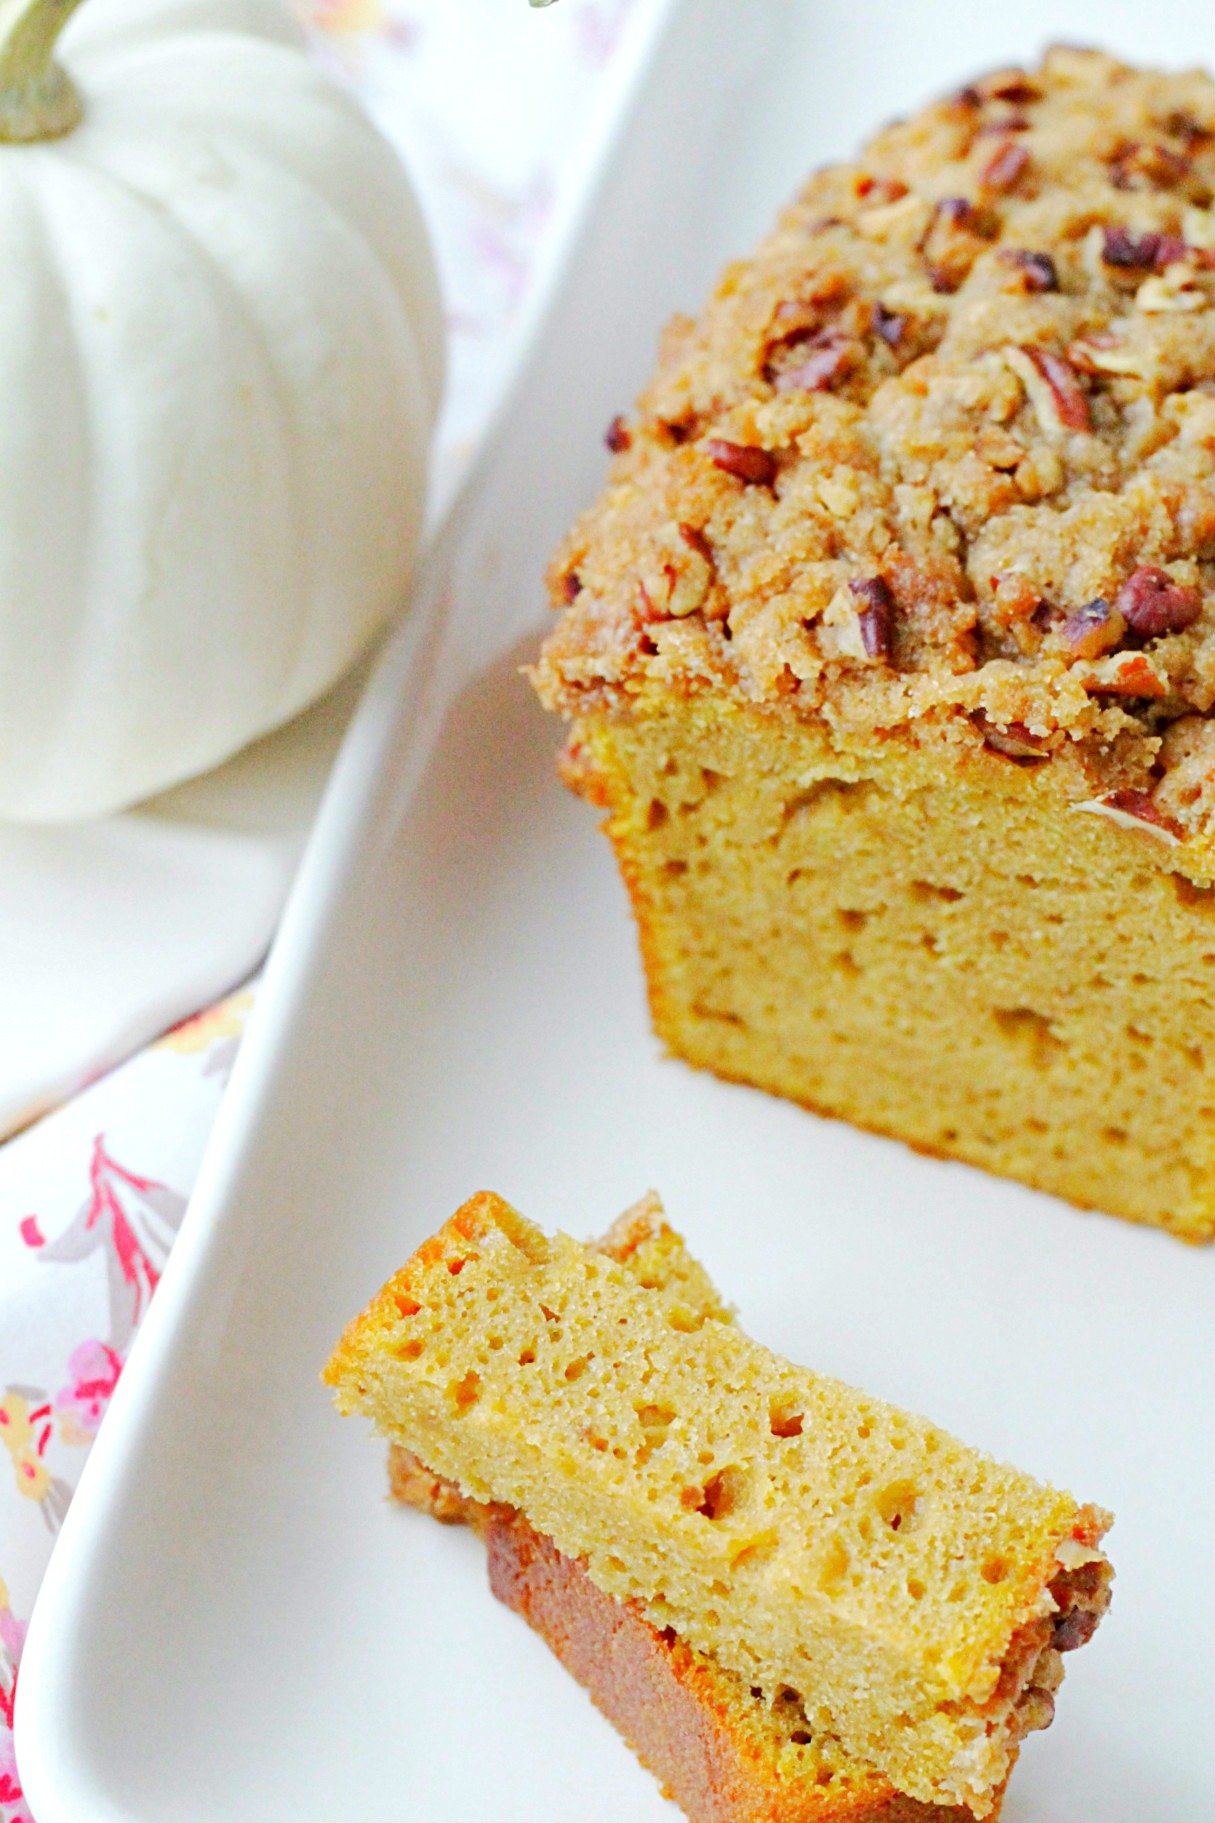 loaf of really good pumpkin bread sliced